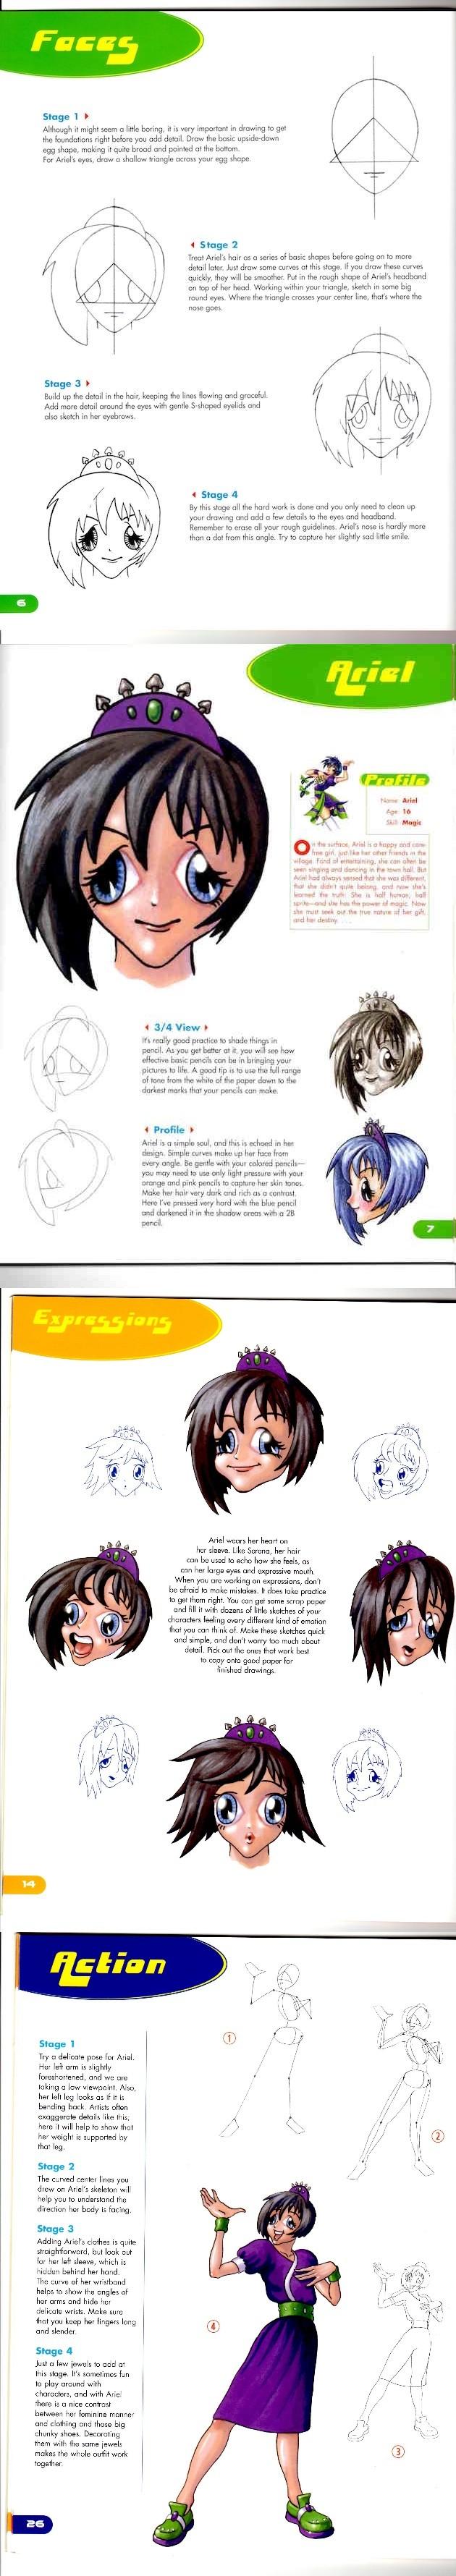 Draw Manga for Kids(子供向け「マンガの描き方」)に関連した画像-02